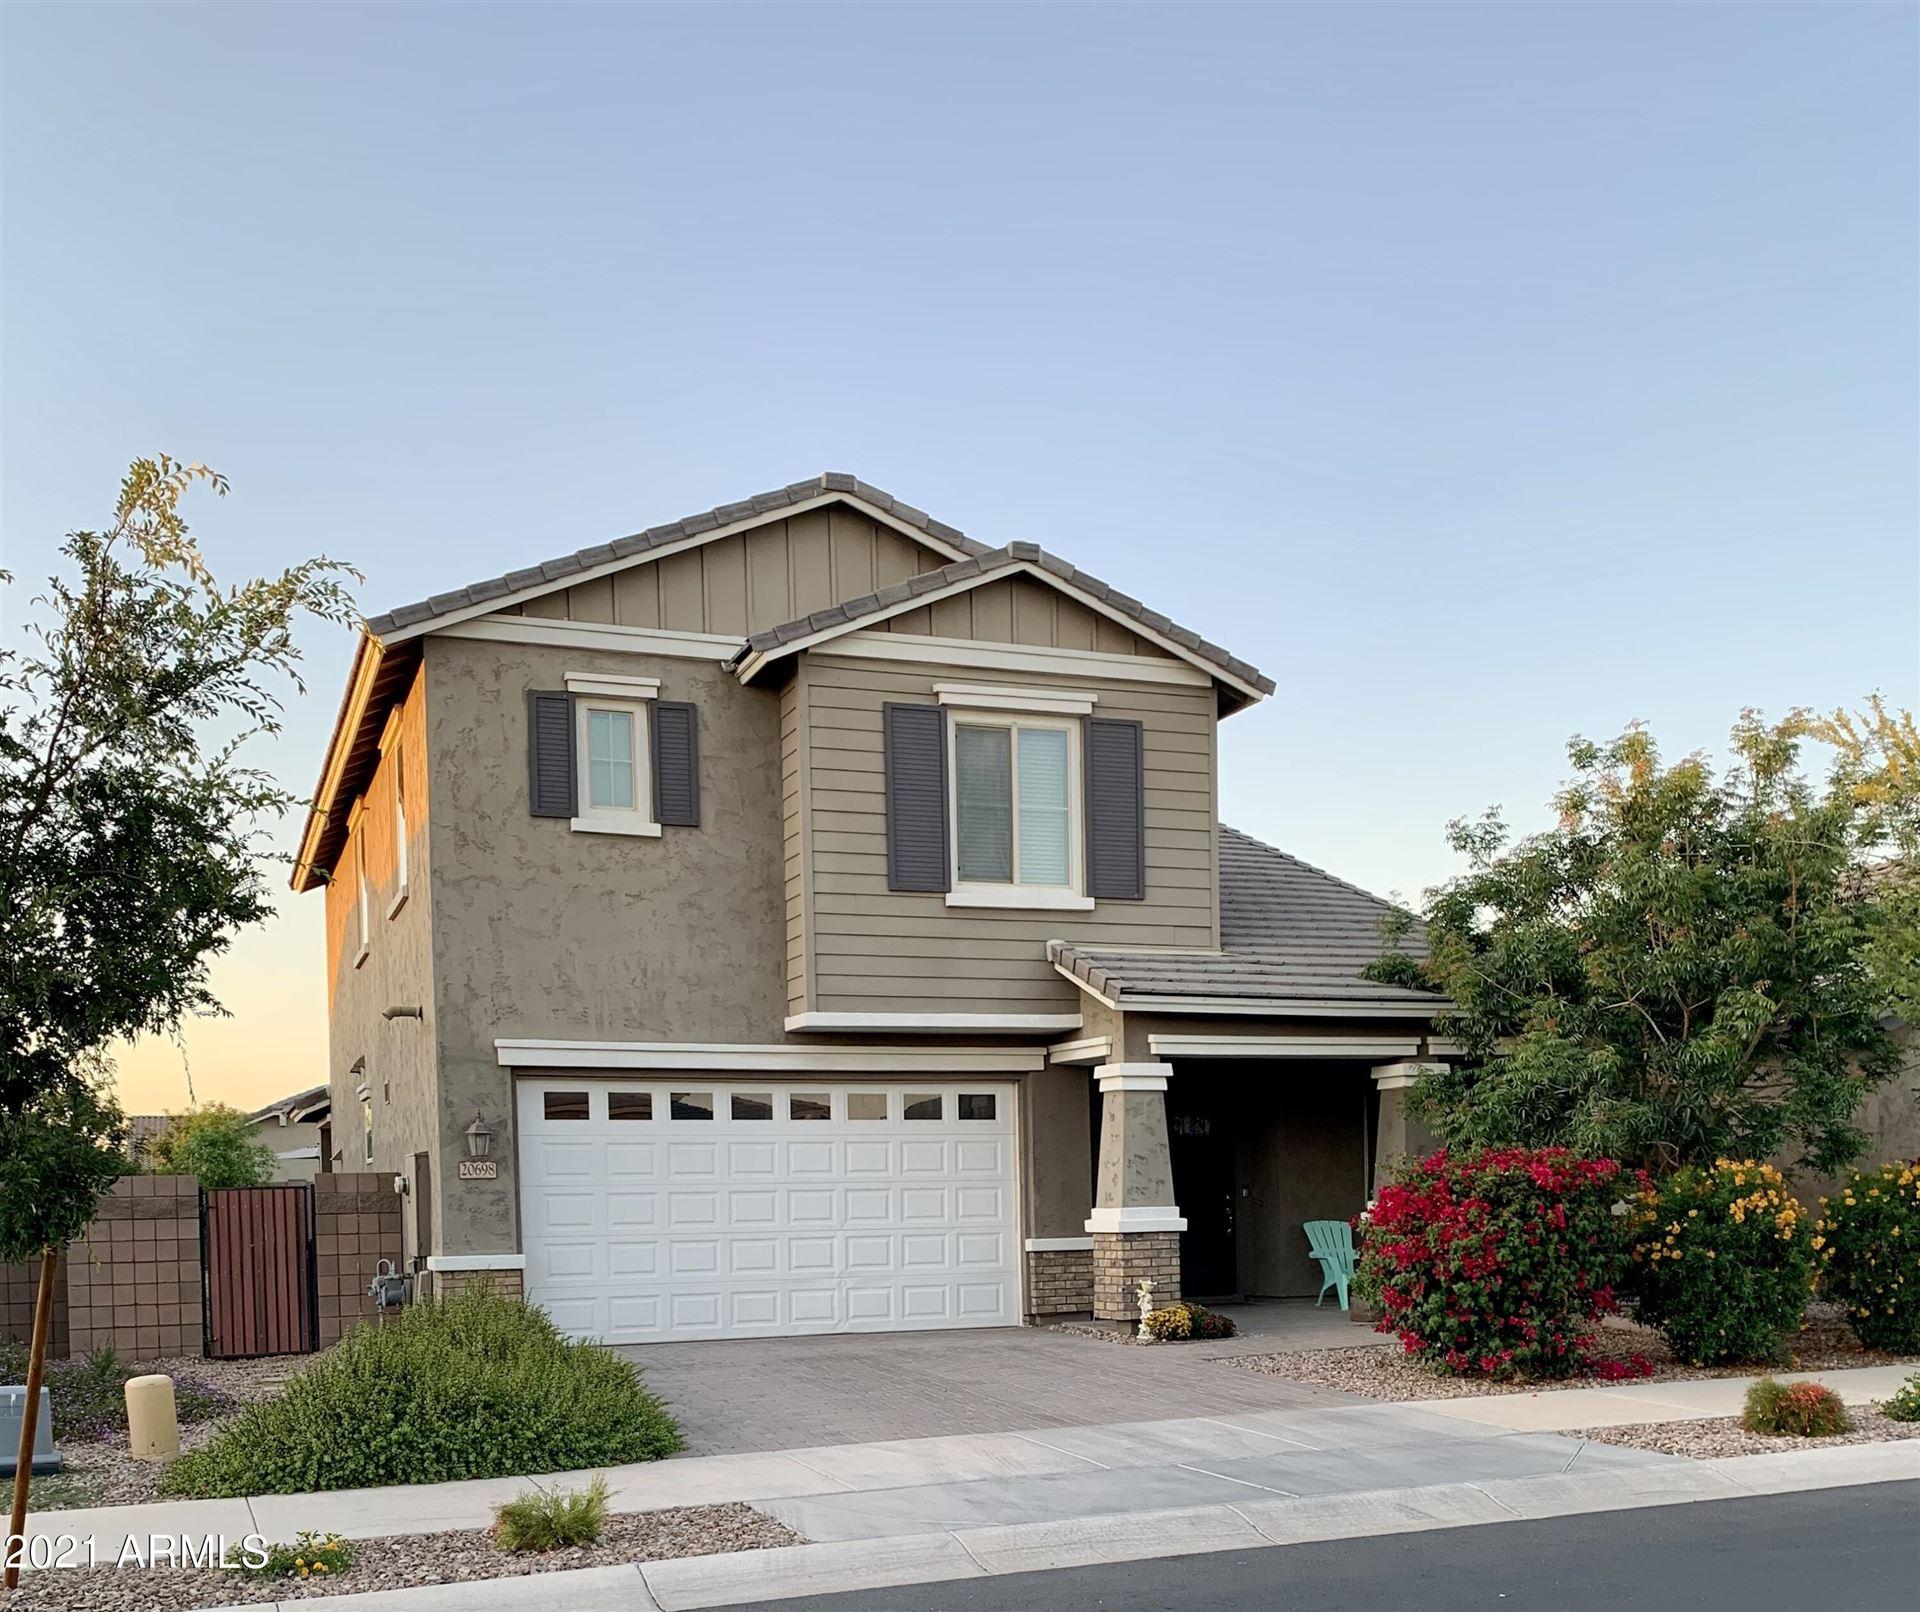 Photo of 20698 E CANARY Way, Queen Creek, AZ 85142 (MLS # 6231363)